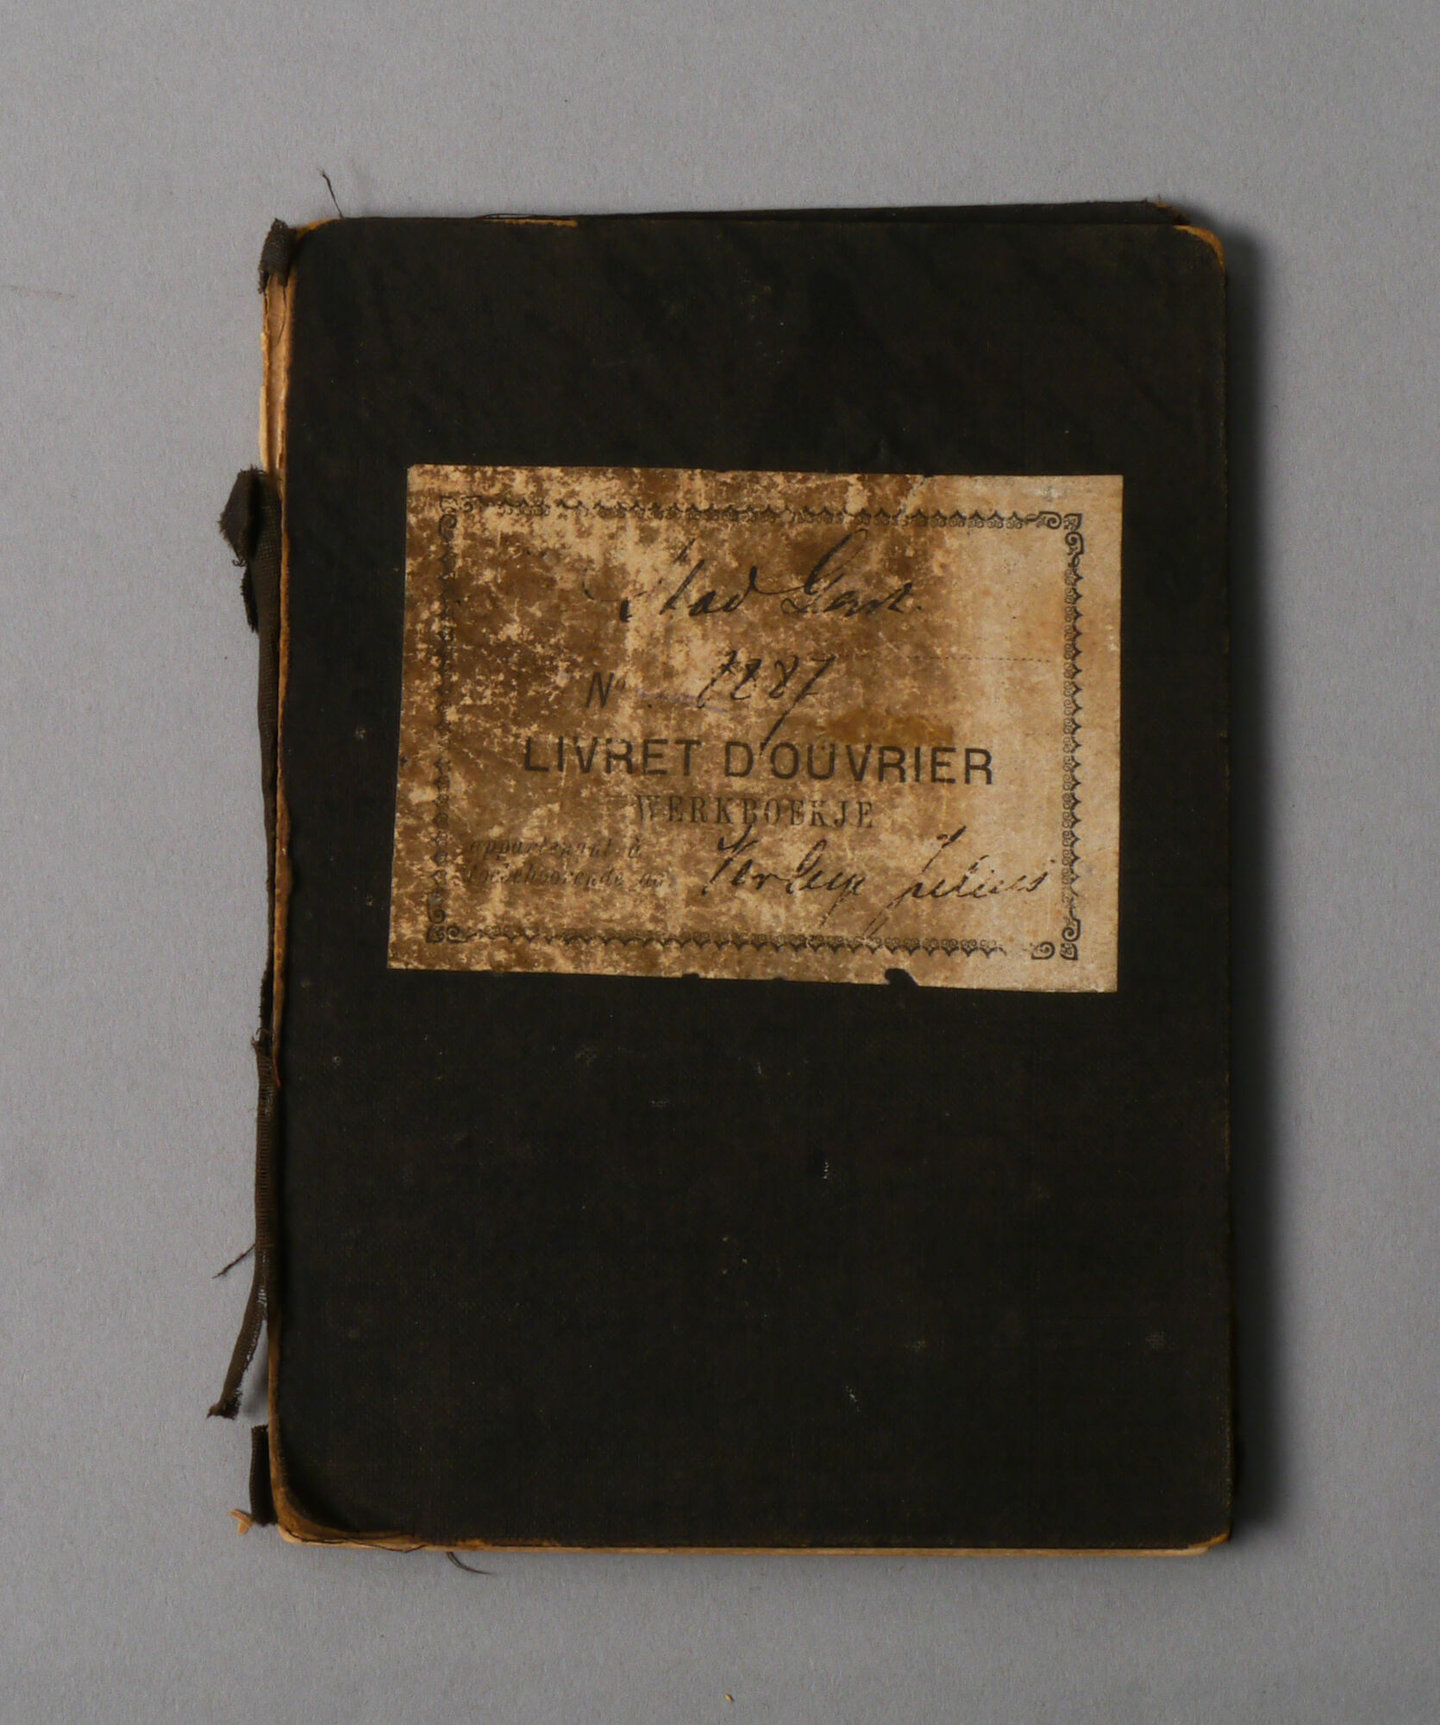 Werkboekje van Julius Verleye